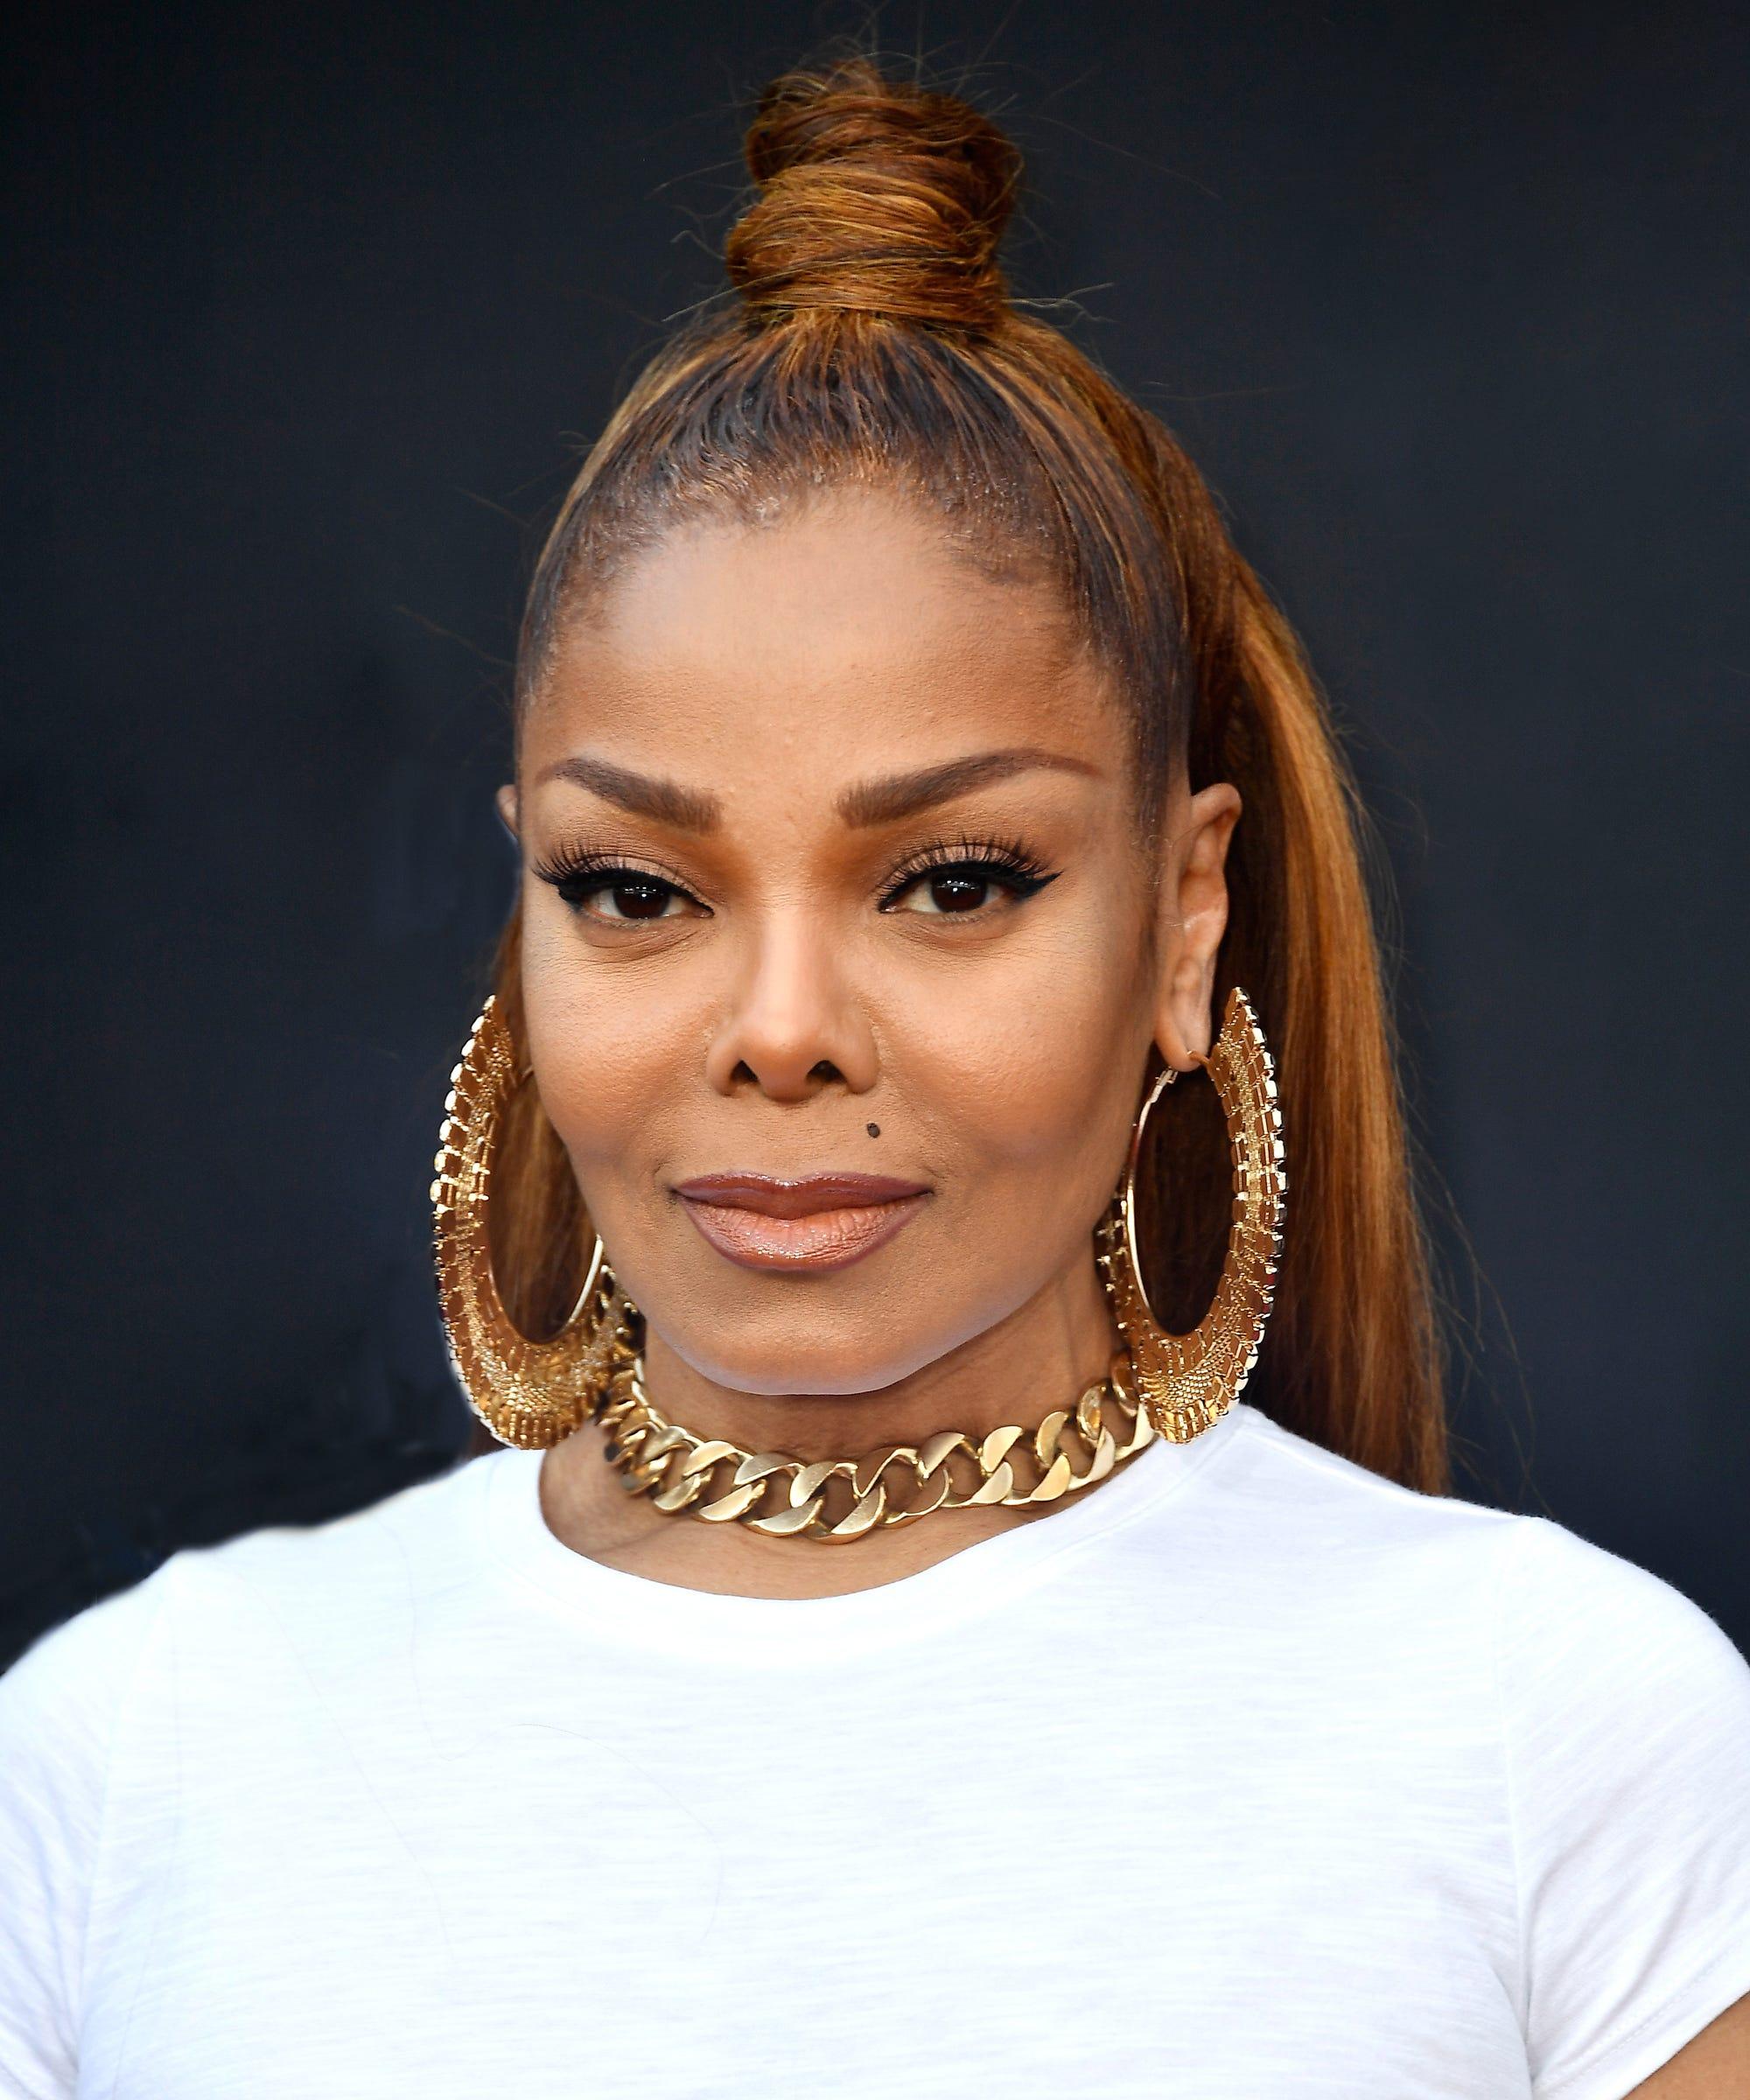 Janet Jackson Calls Police On Ex Wissam Al Mana For Son